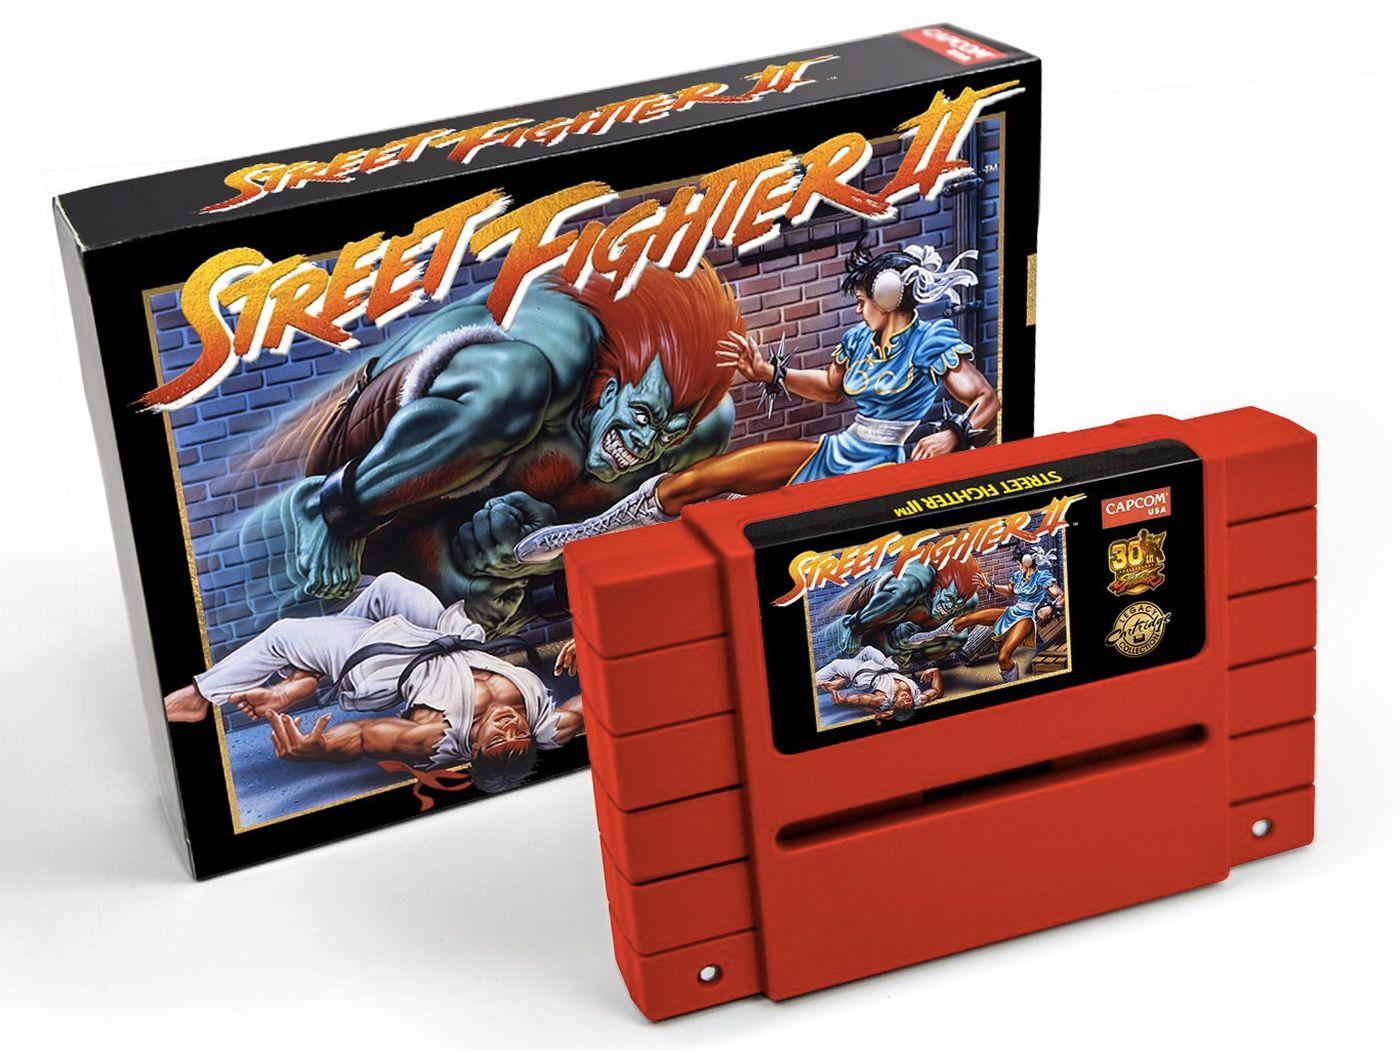 Capcom Re Releasing Street Fighter 2 On Snes Cartridge Polygon